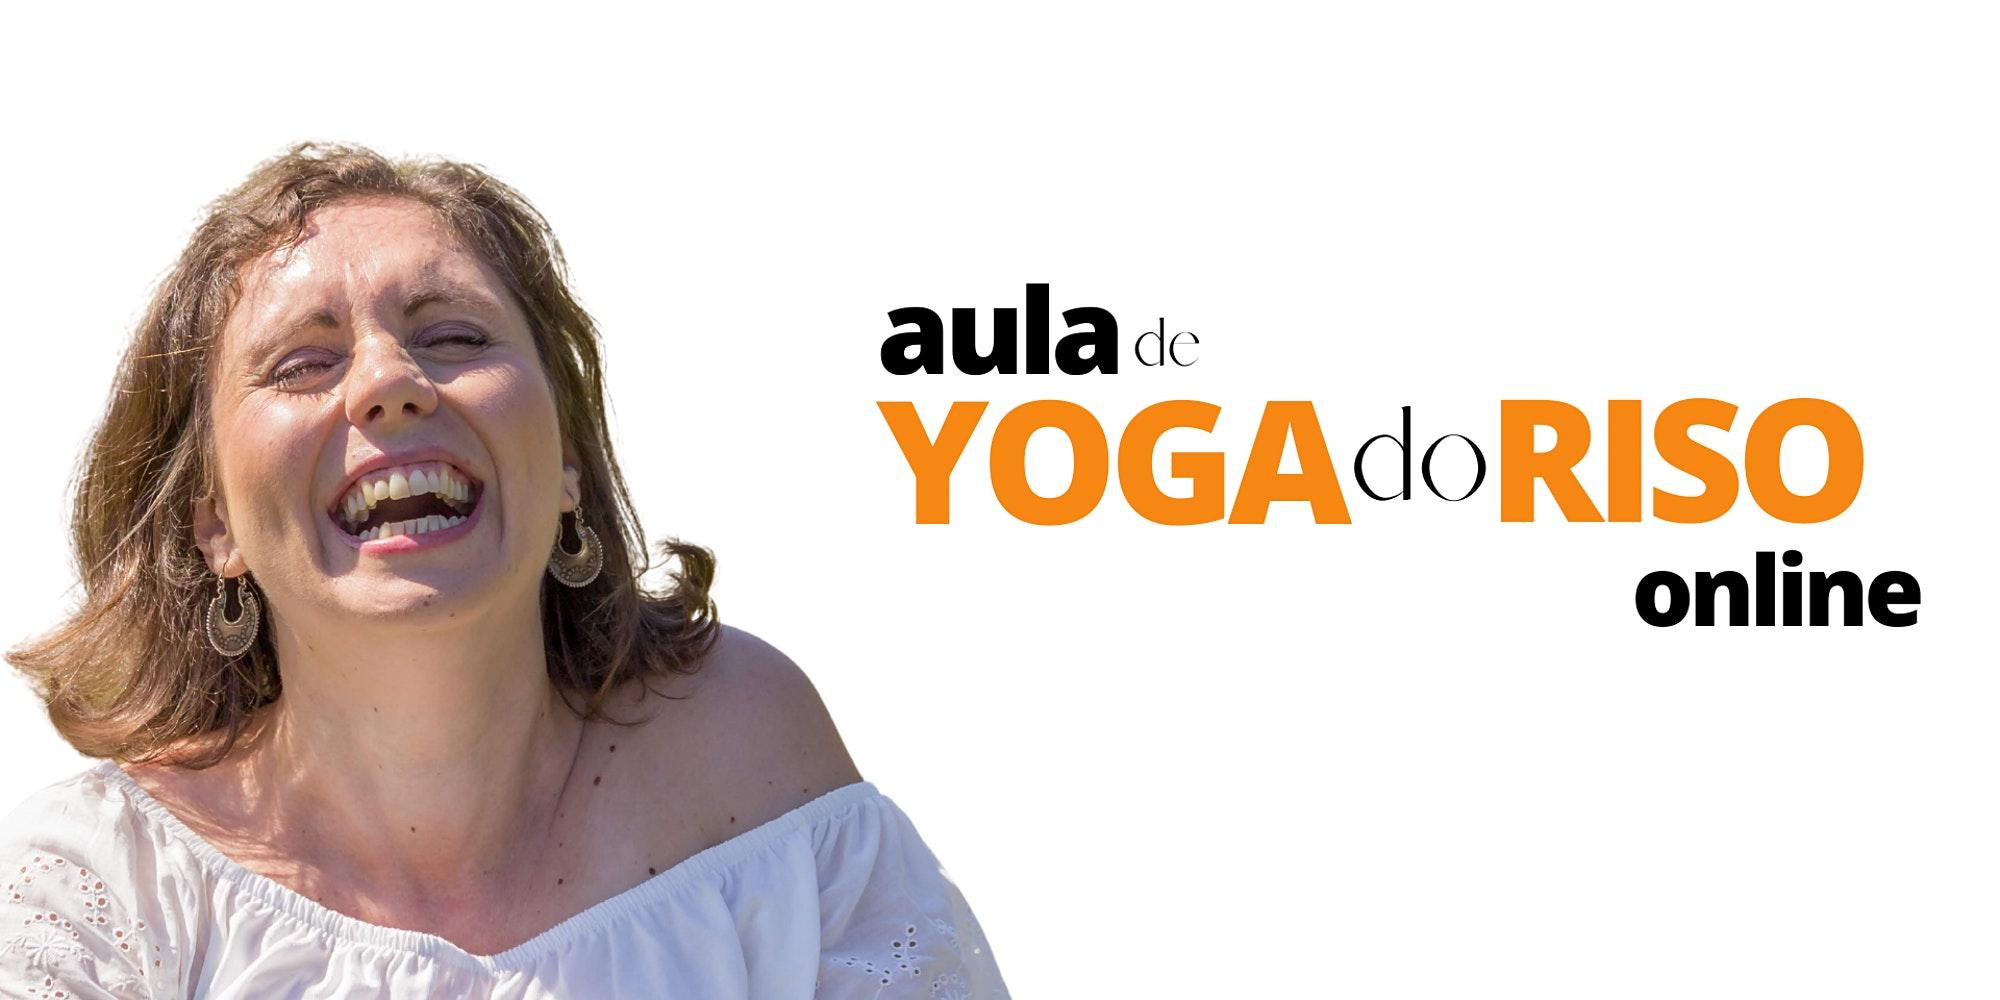 Aula de Yoga do Riso